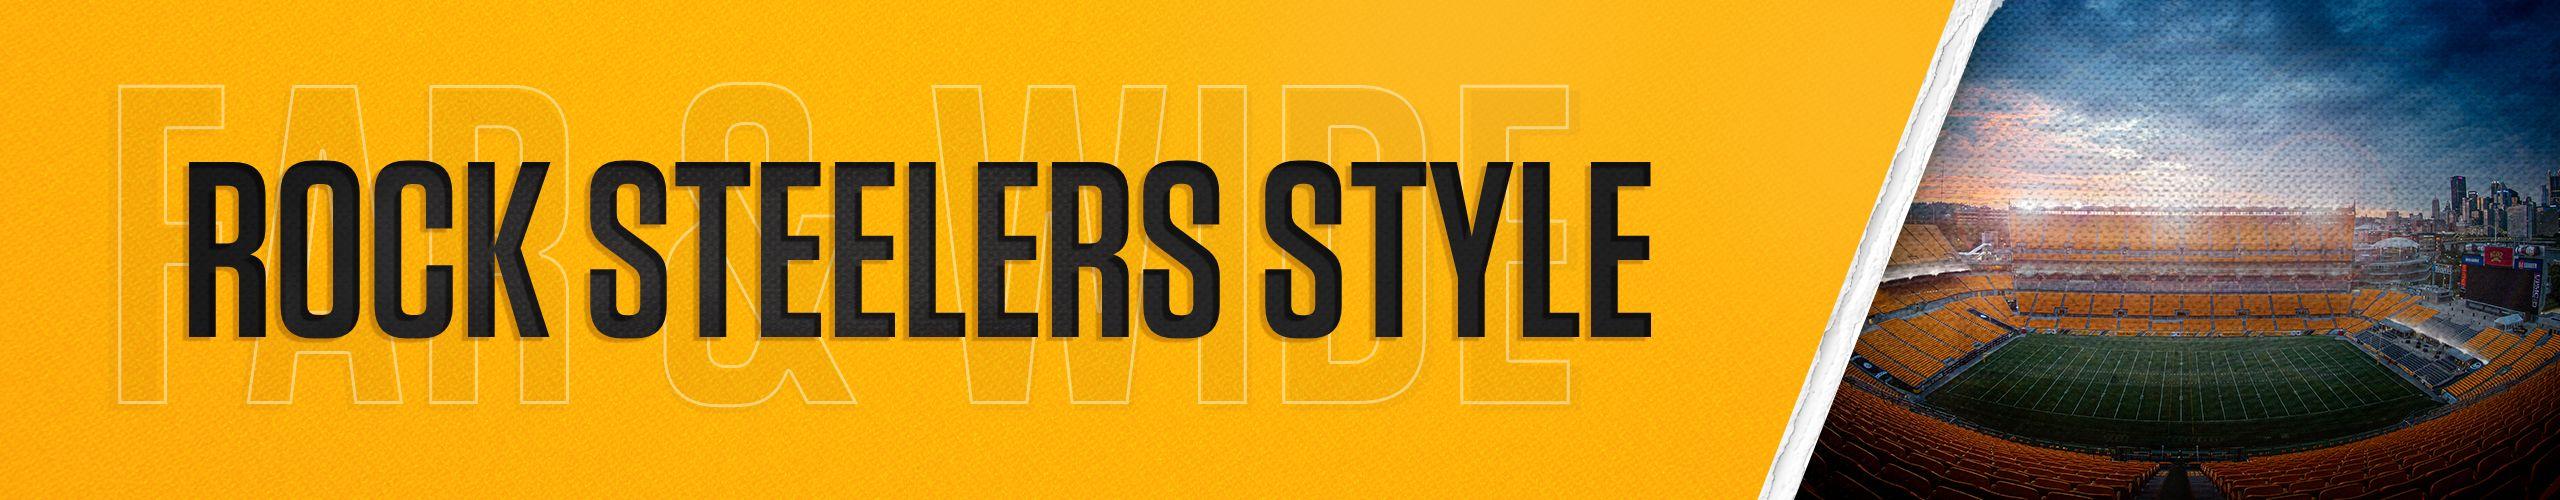 EventHeader_RockSteelersStyle_Far&Wide